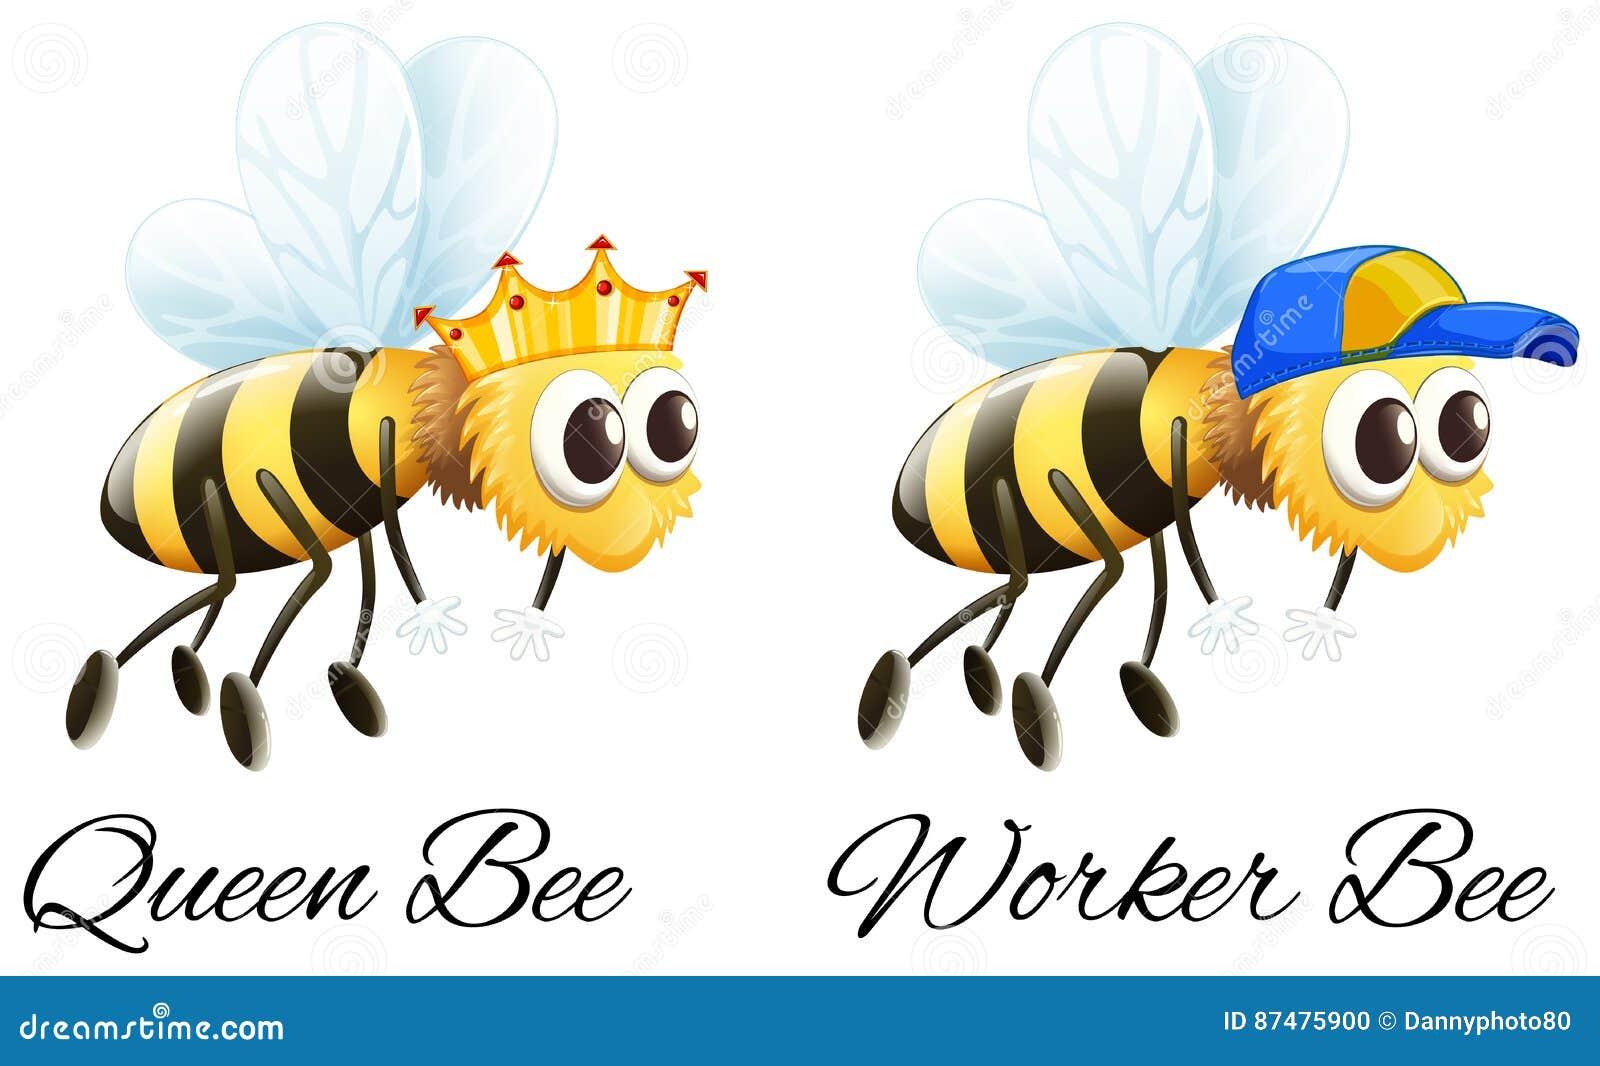 Характеры пчелы королевы пчел и работника